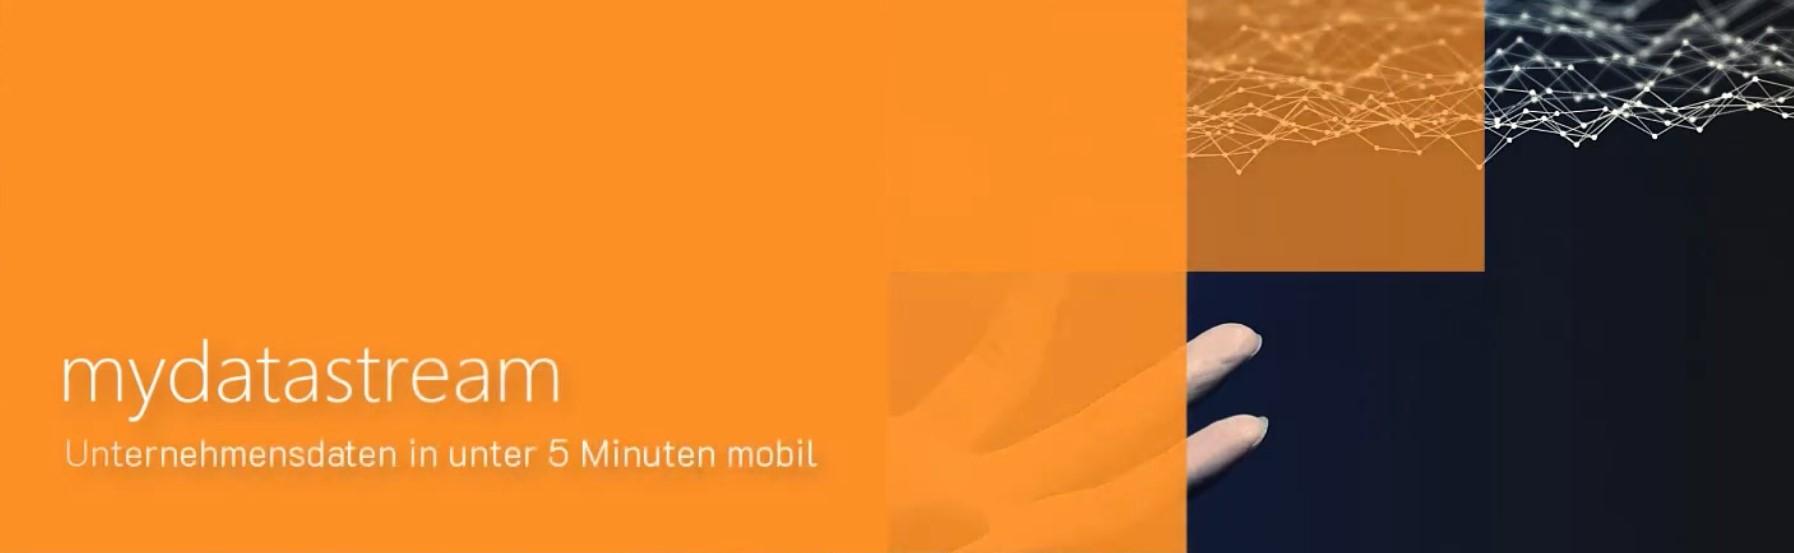 www.mydatastream.de